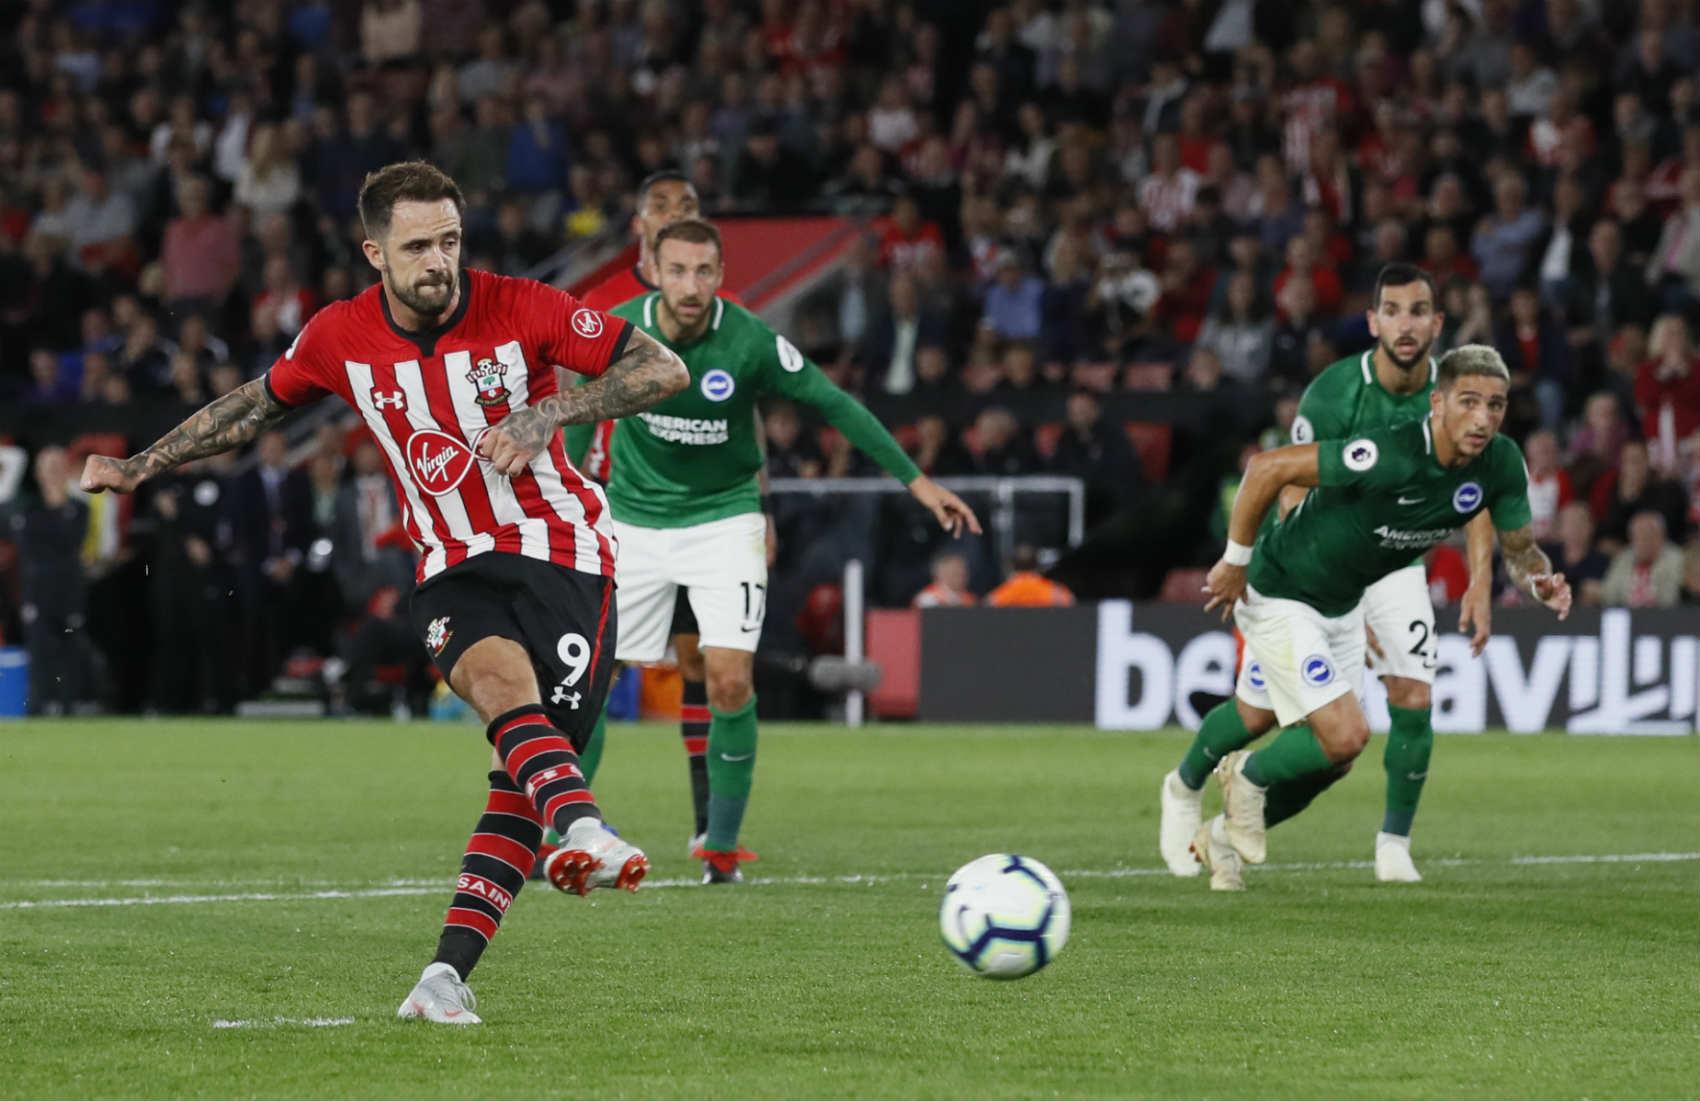 Southampton vs Chelsea predictions